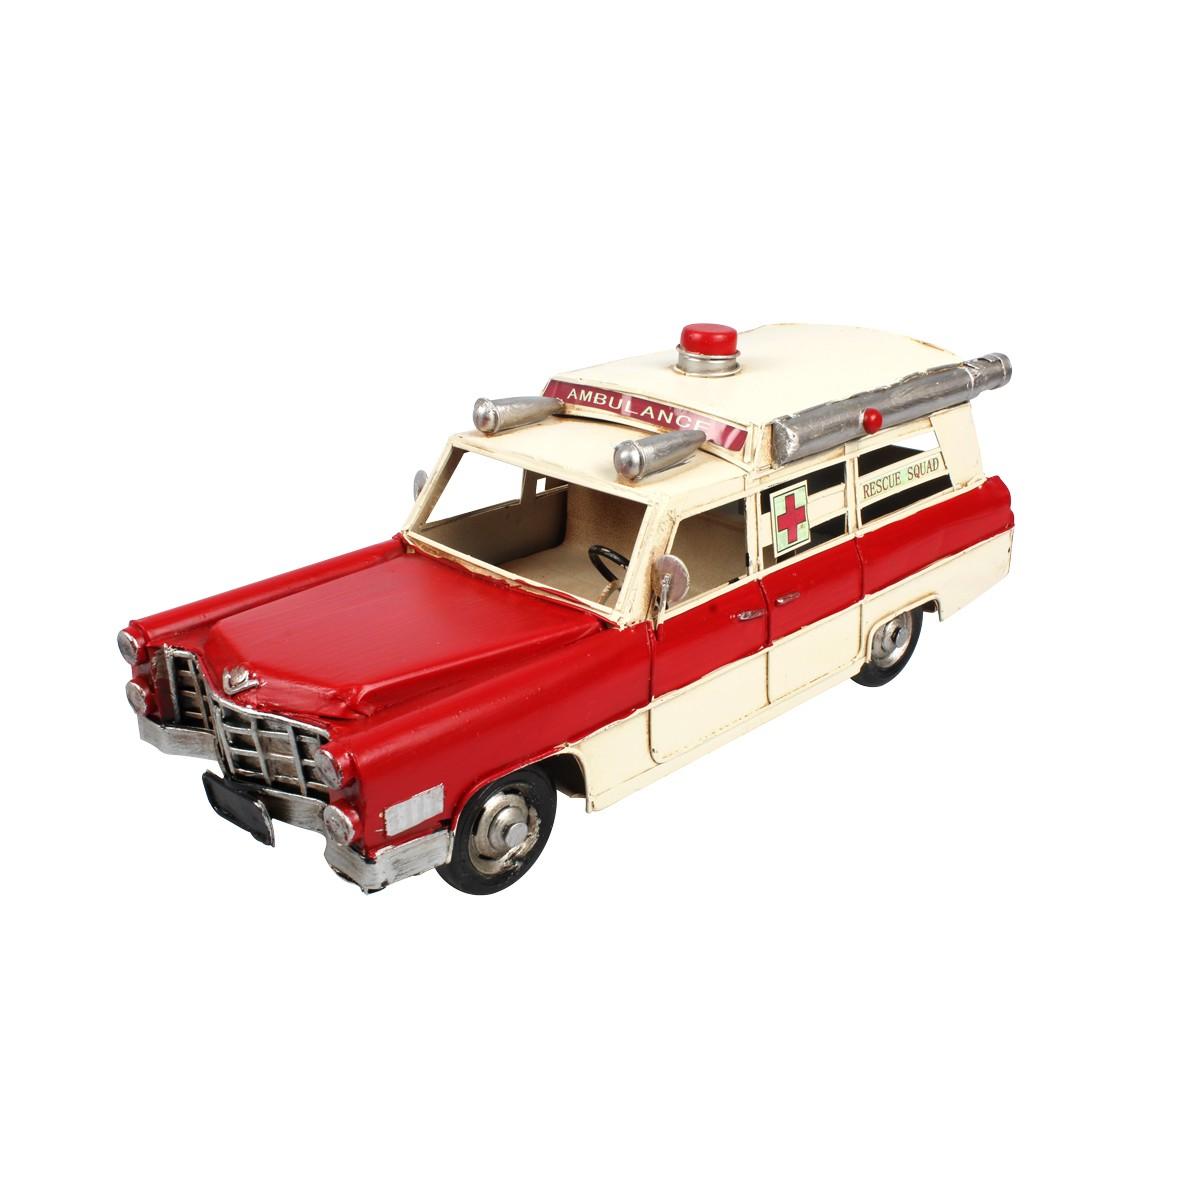 Enfeite de Metal Retrô Cadillac 1966 Ambulância Rescue Squad